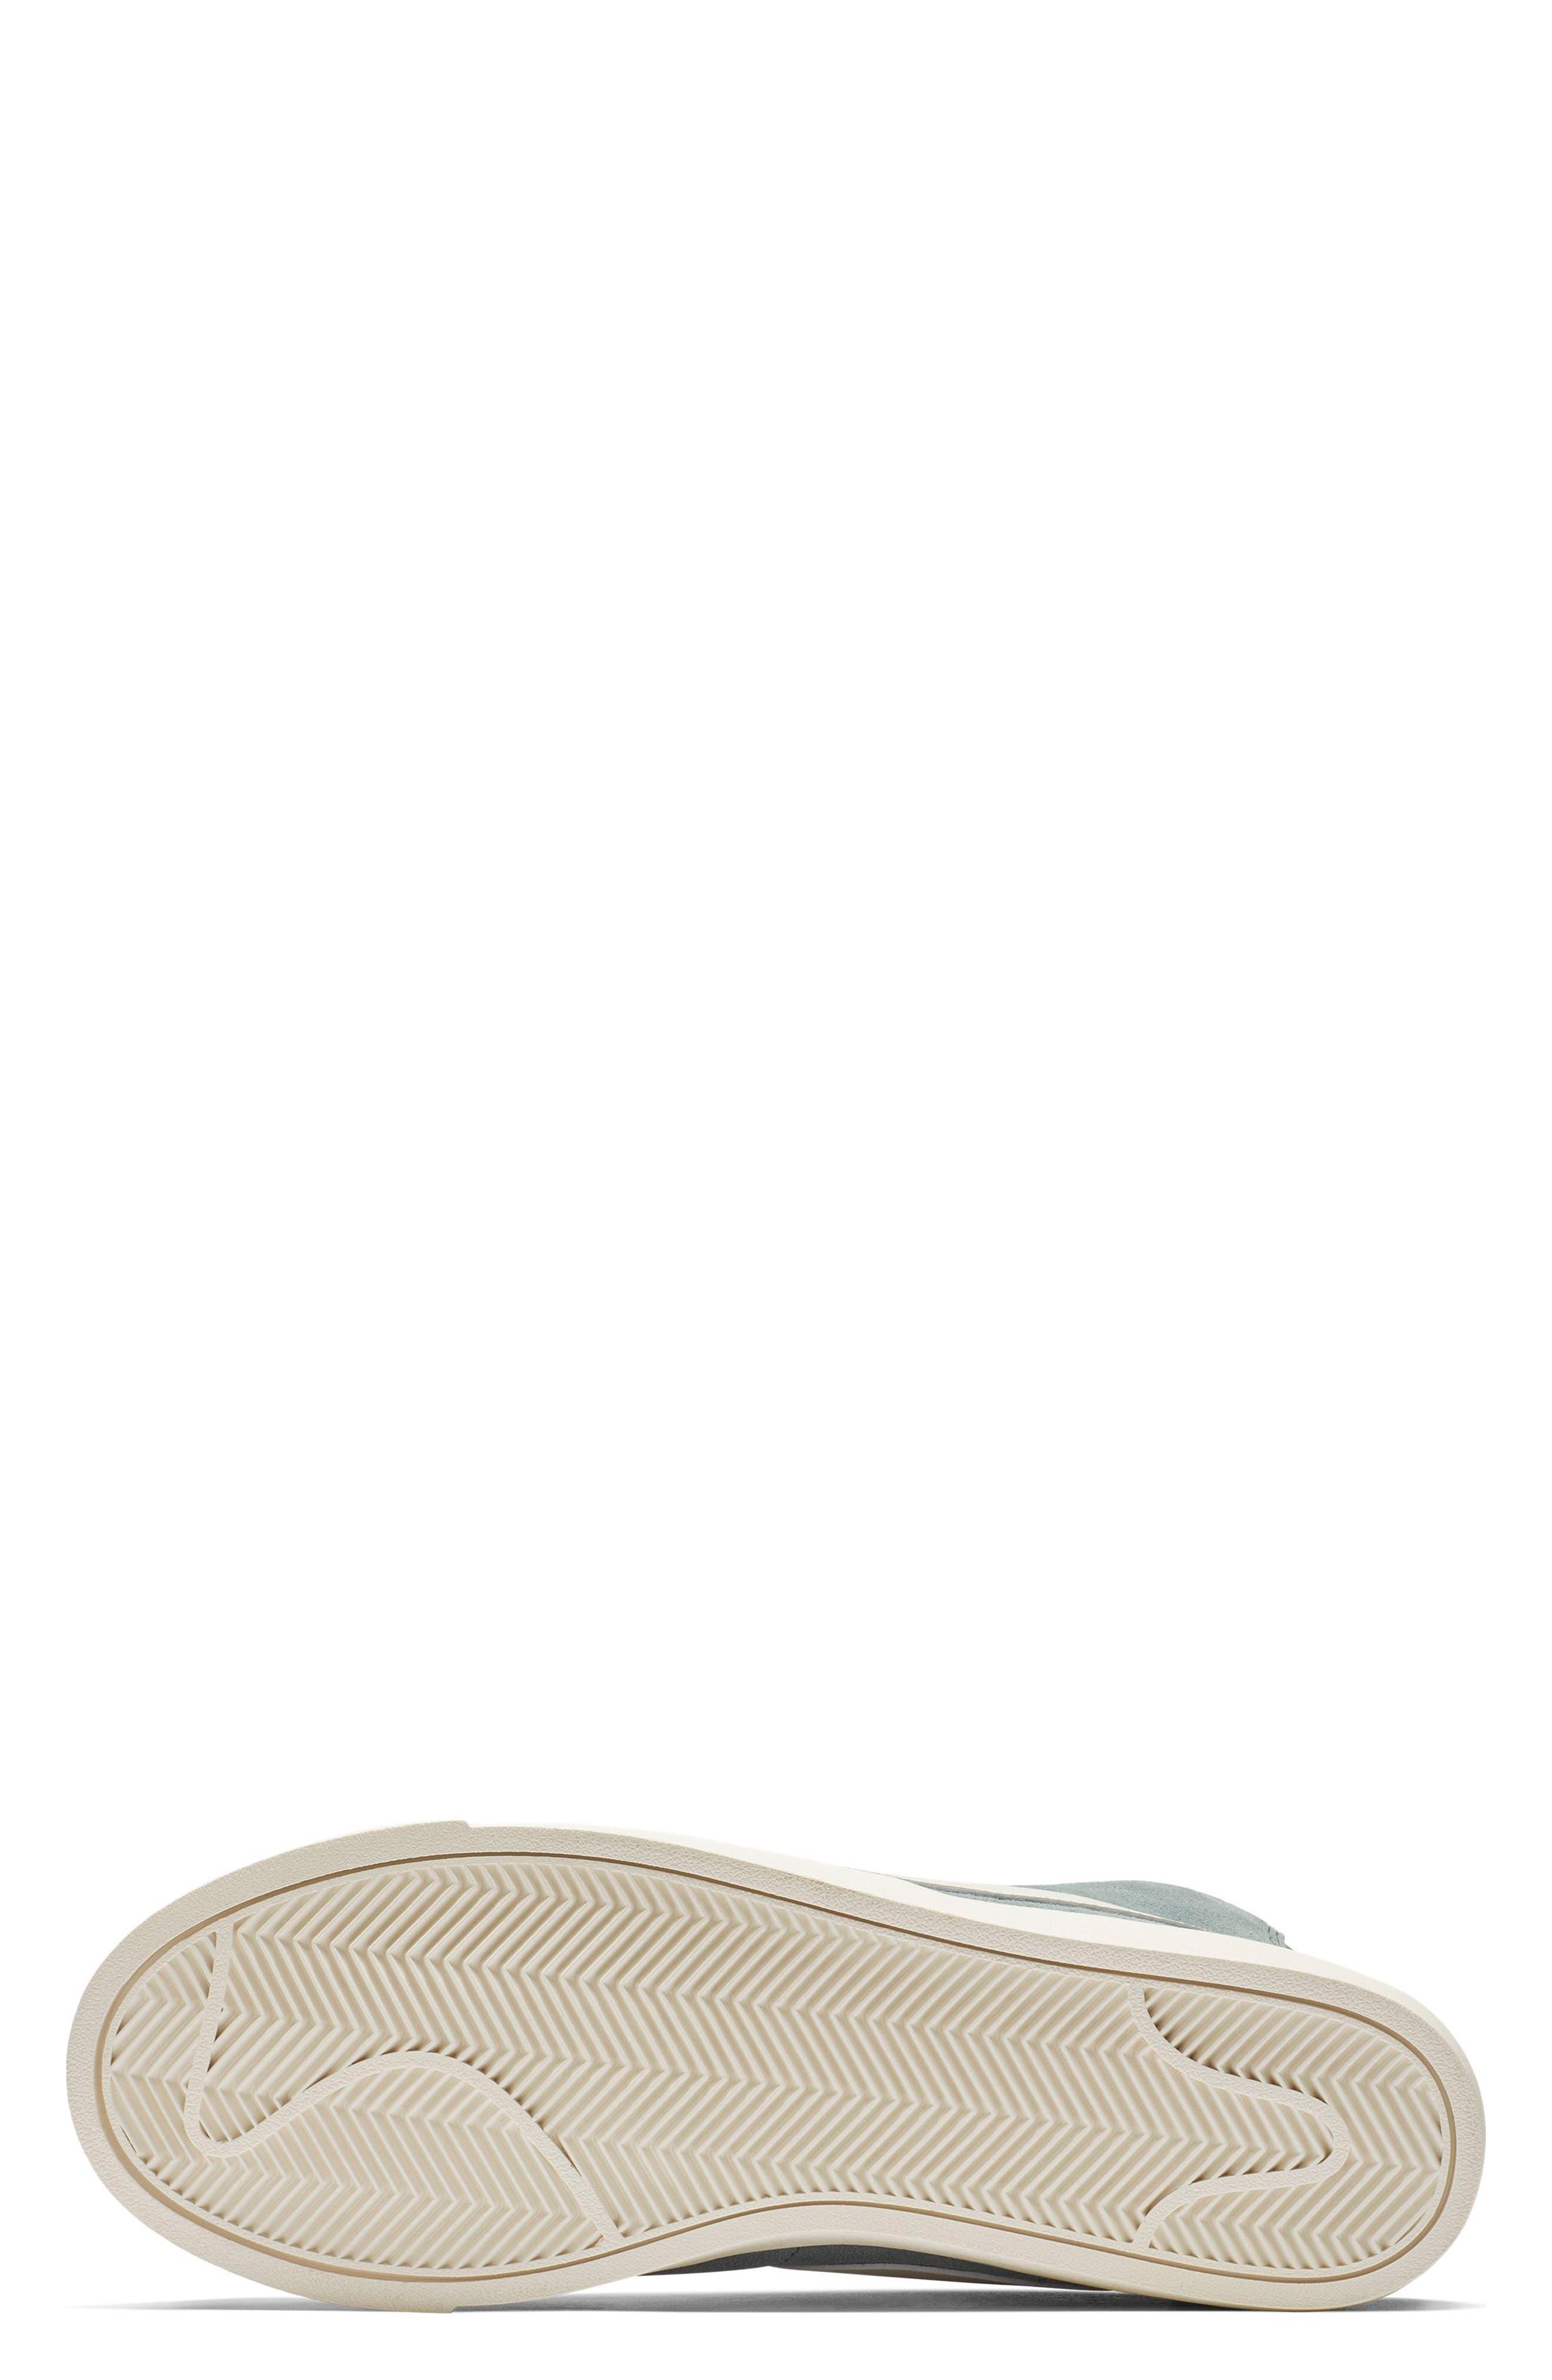 NIKE, Blazer Mid Vintage Sneaker, Alternate thumbnail 5, color, AVIATOR GREY/ SAIL/ BLUE